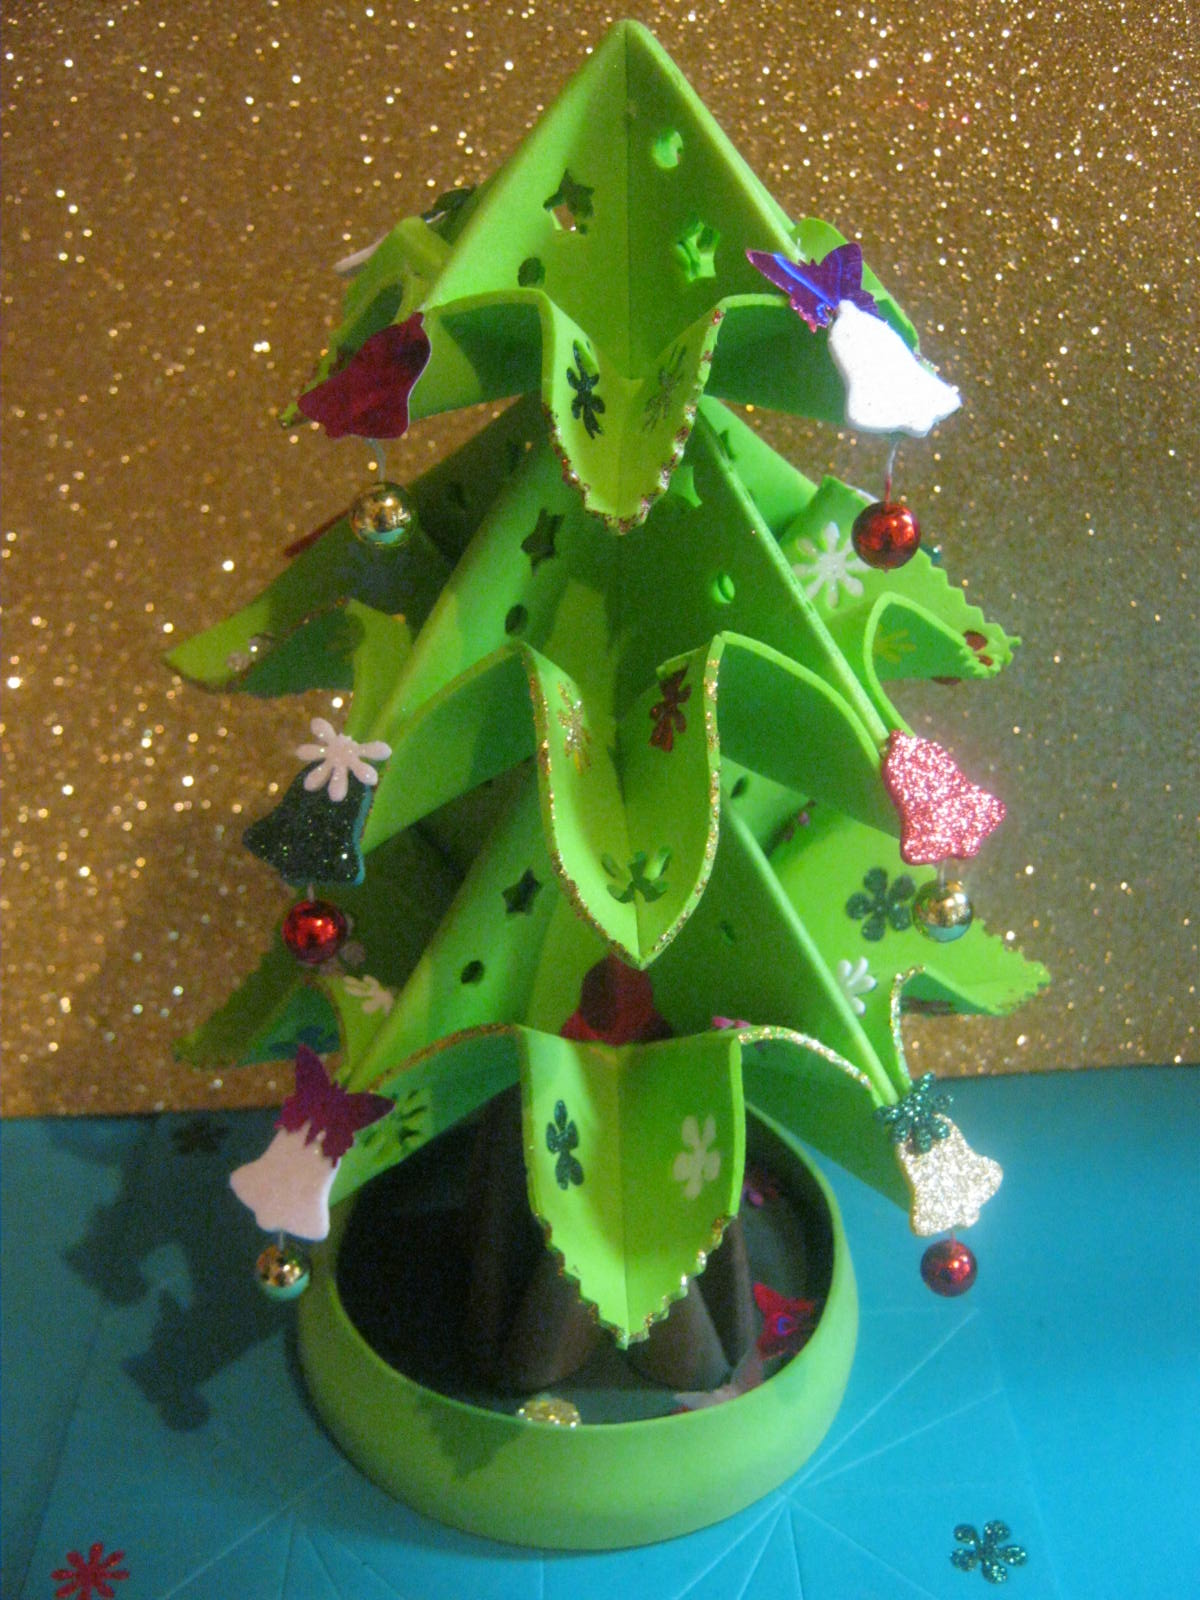 Zona purpura christmas tree arbolito de navidad arbol - Decoracion navidad goma eva ...